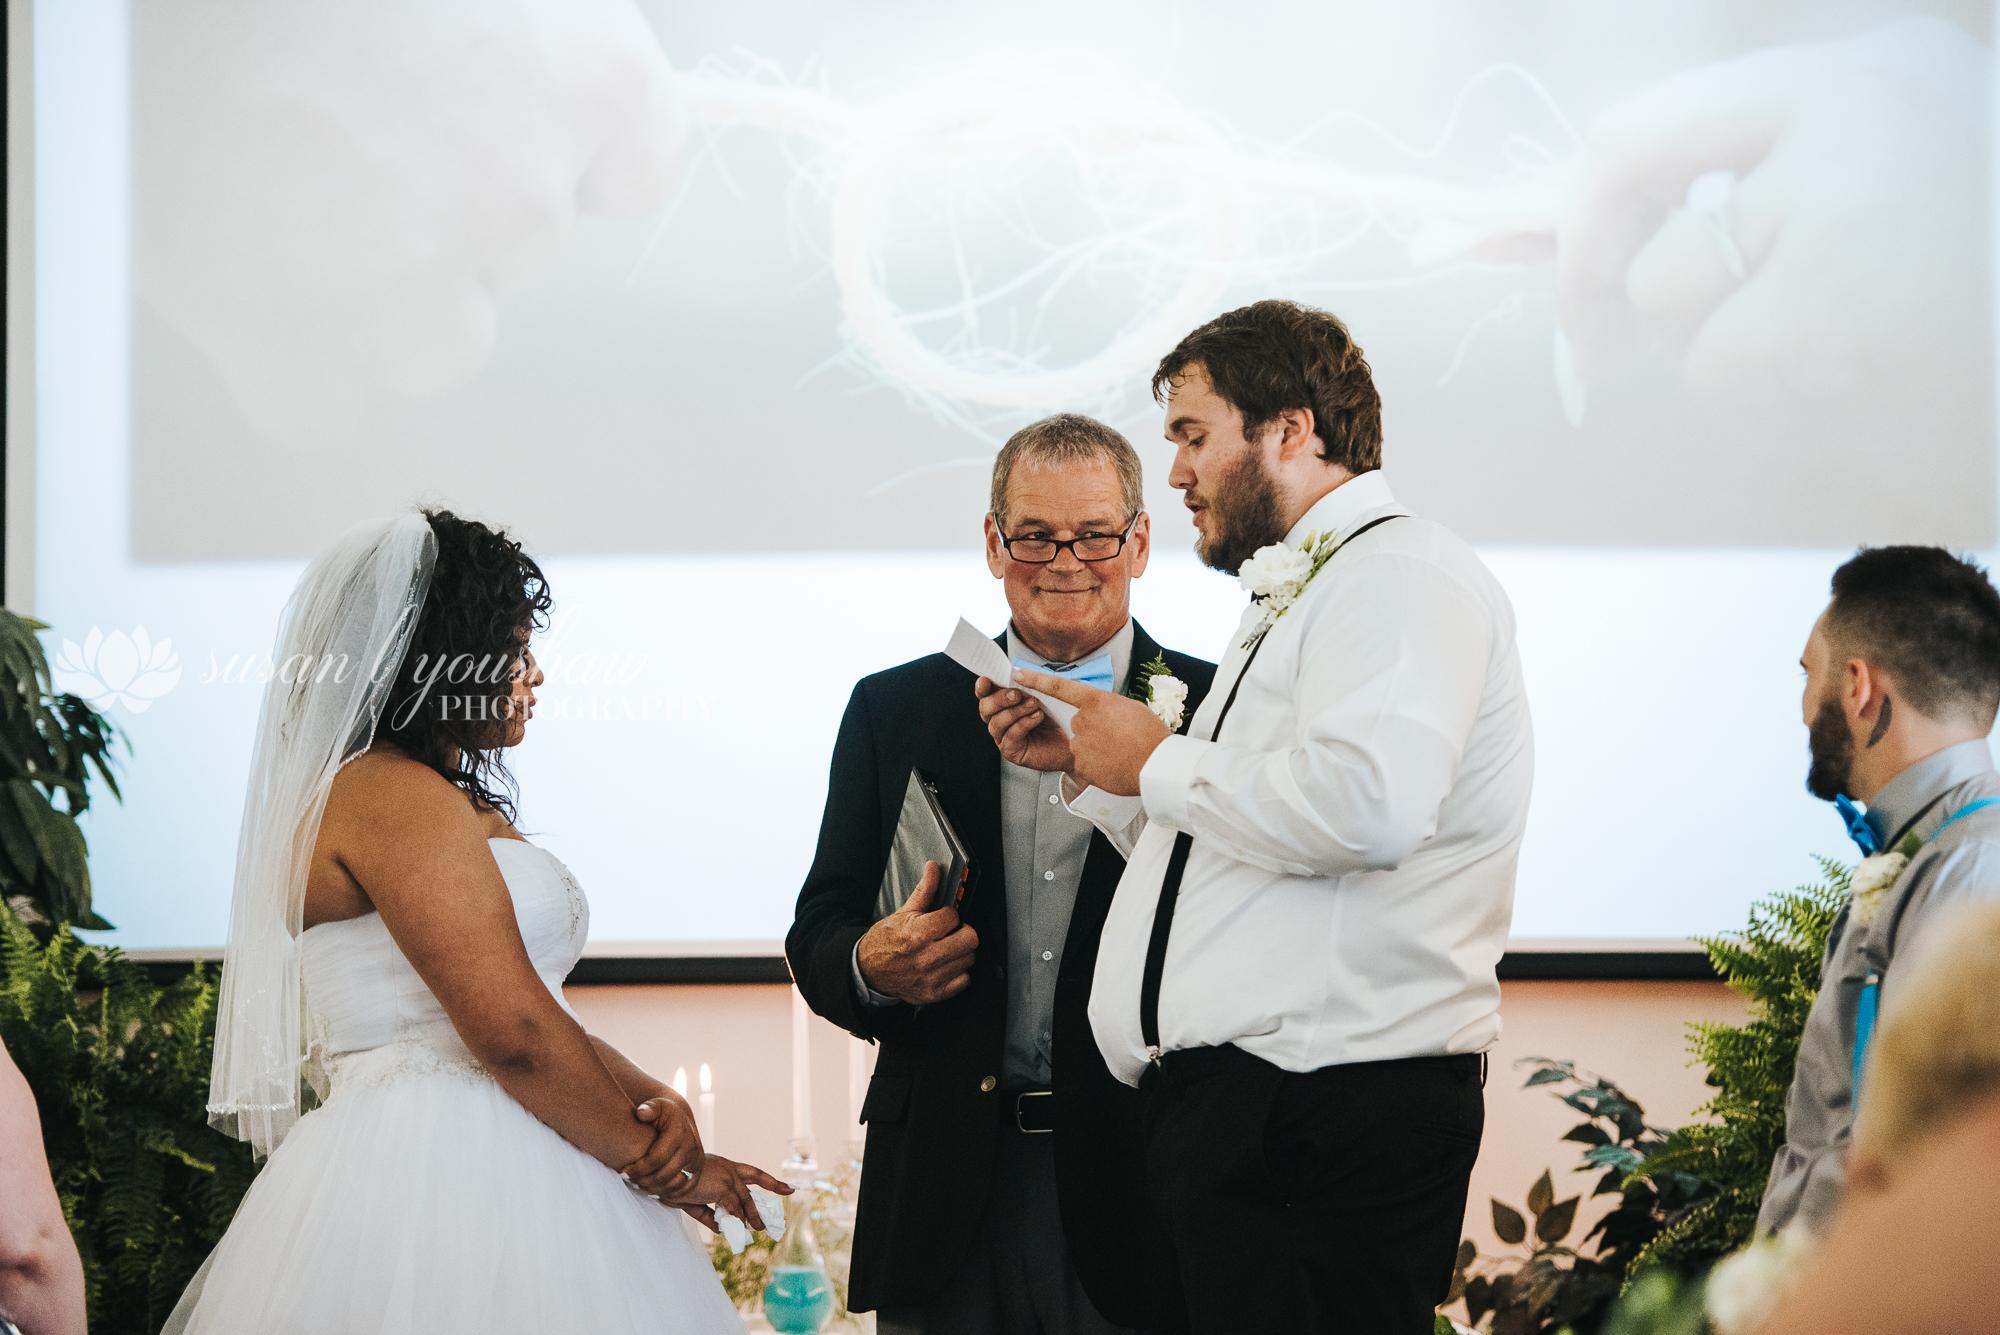 Katelyn and Wes Wedding Photos 07-13-2019 SLY Photography-68.jpg